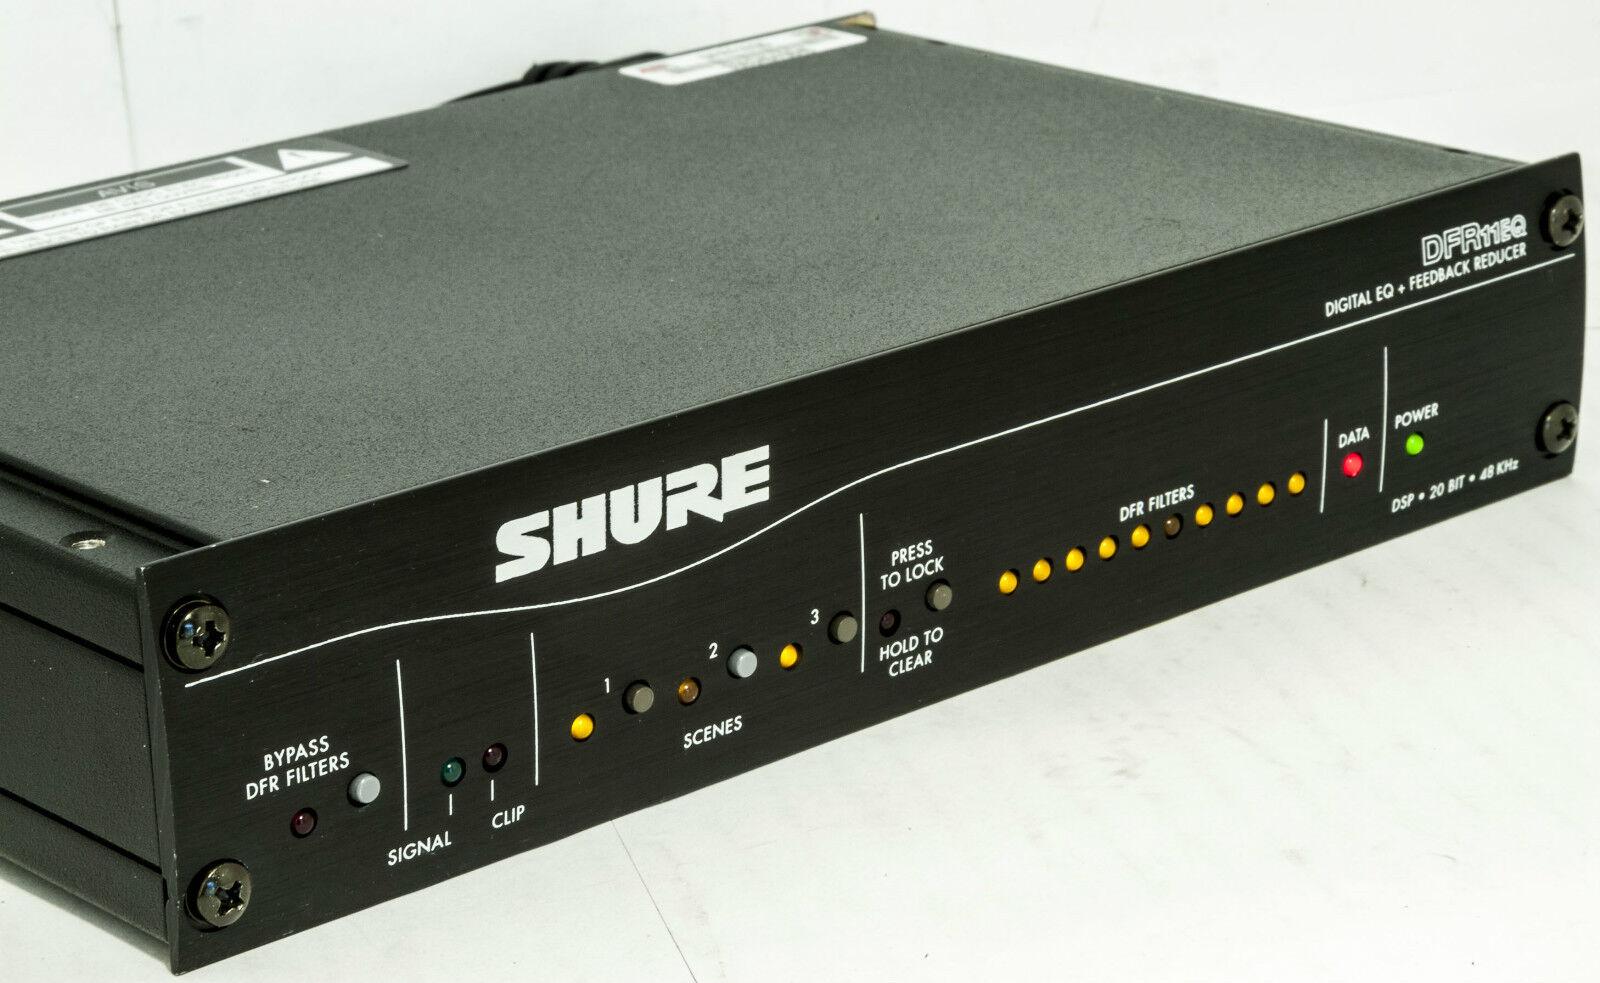 SHURE DFR11EQ5 Digital Signal Processor, Digtal EQ + rotucer Good Unit